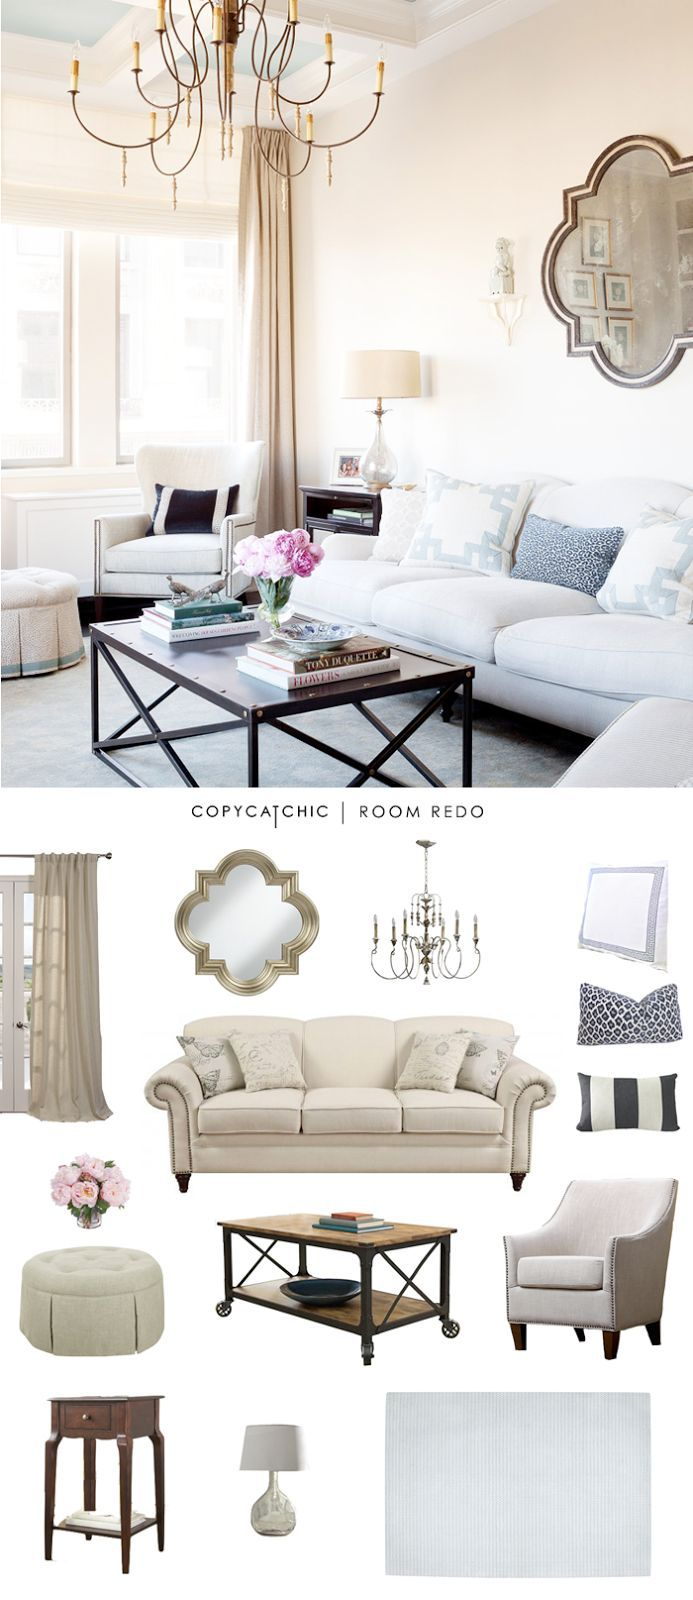 Copy Cat Chic Room Redo | Airy & Feminine Living Room